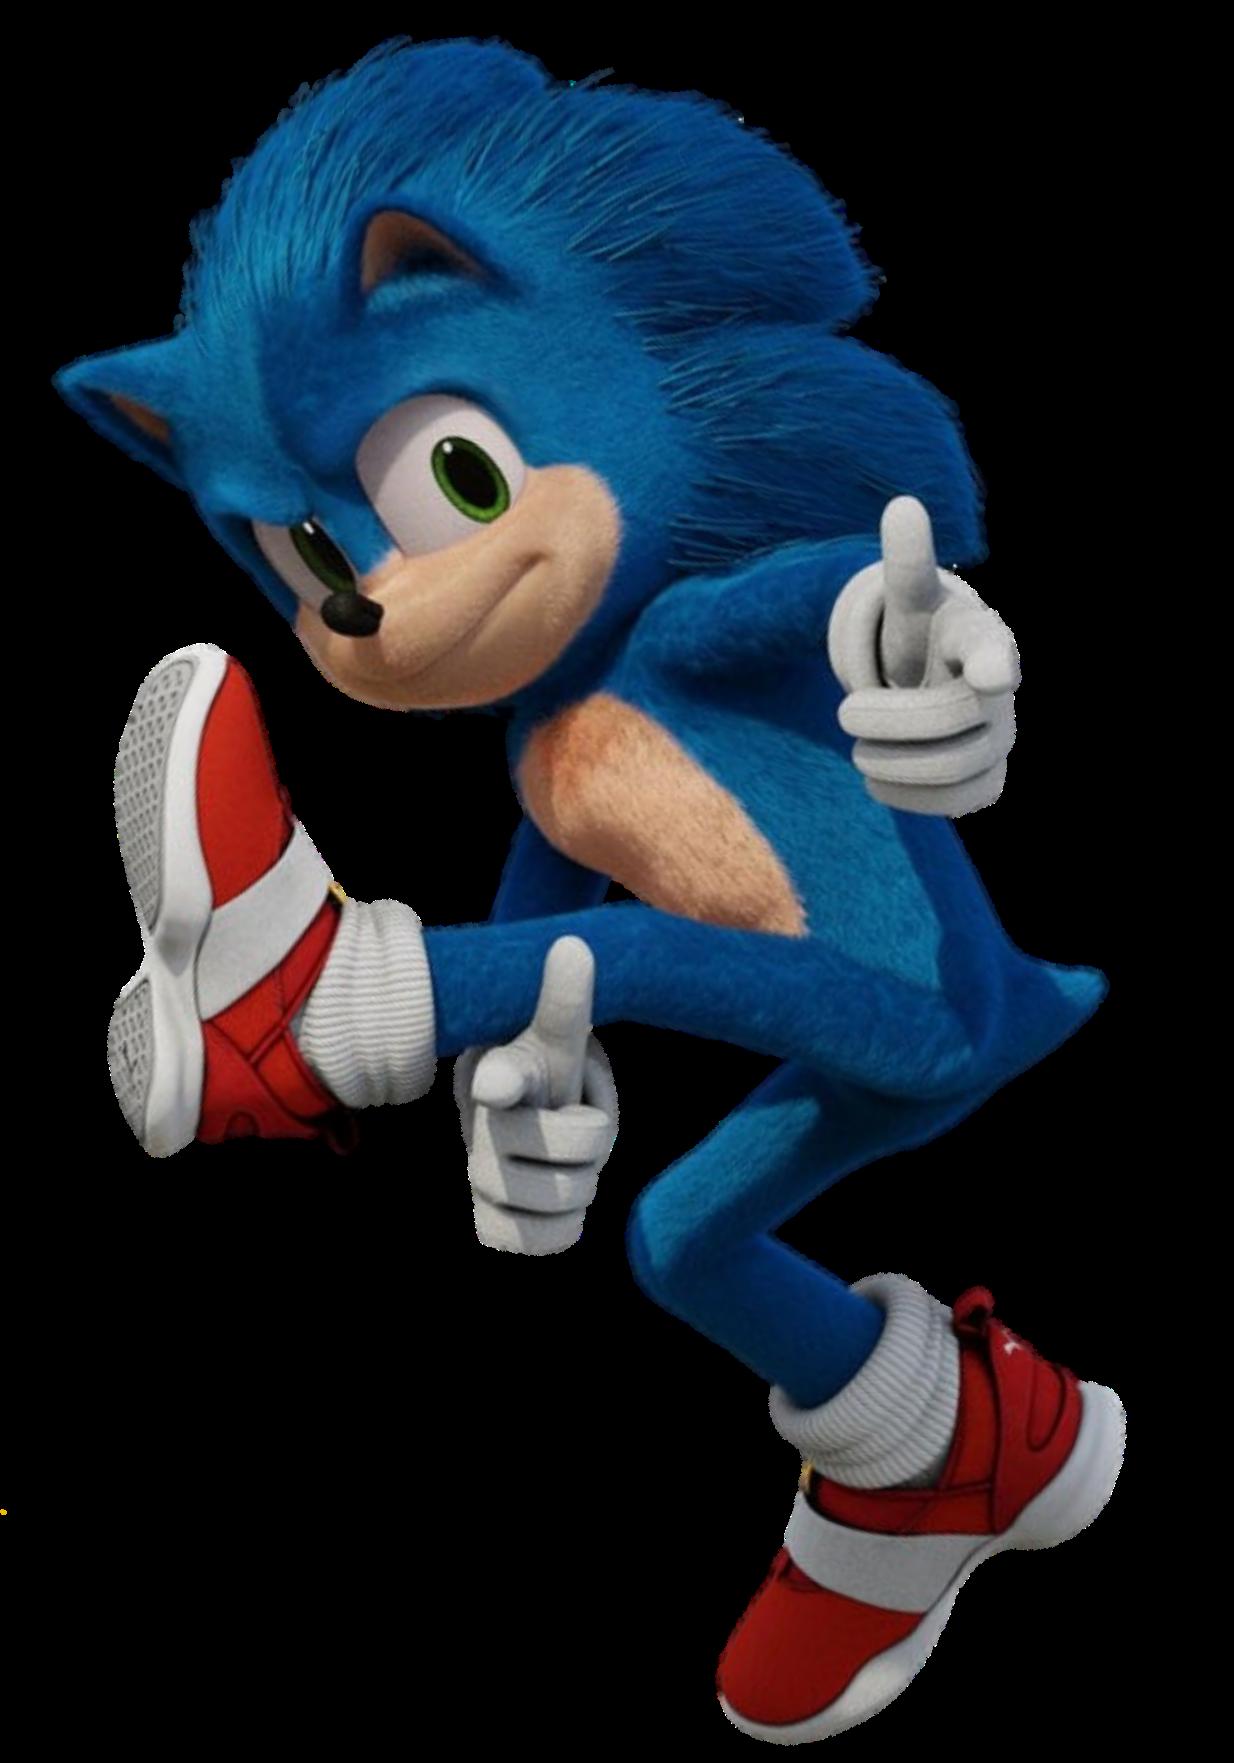 Sonic Pose Style Hedgehog Movie Sonic The Hedgehog Sonic